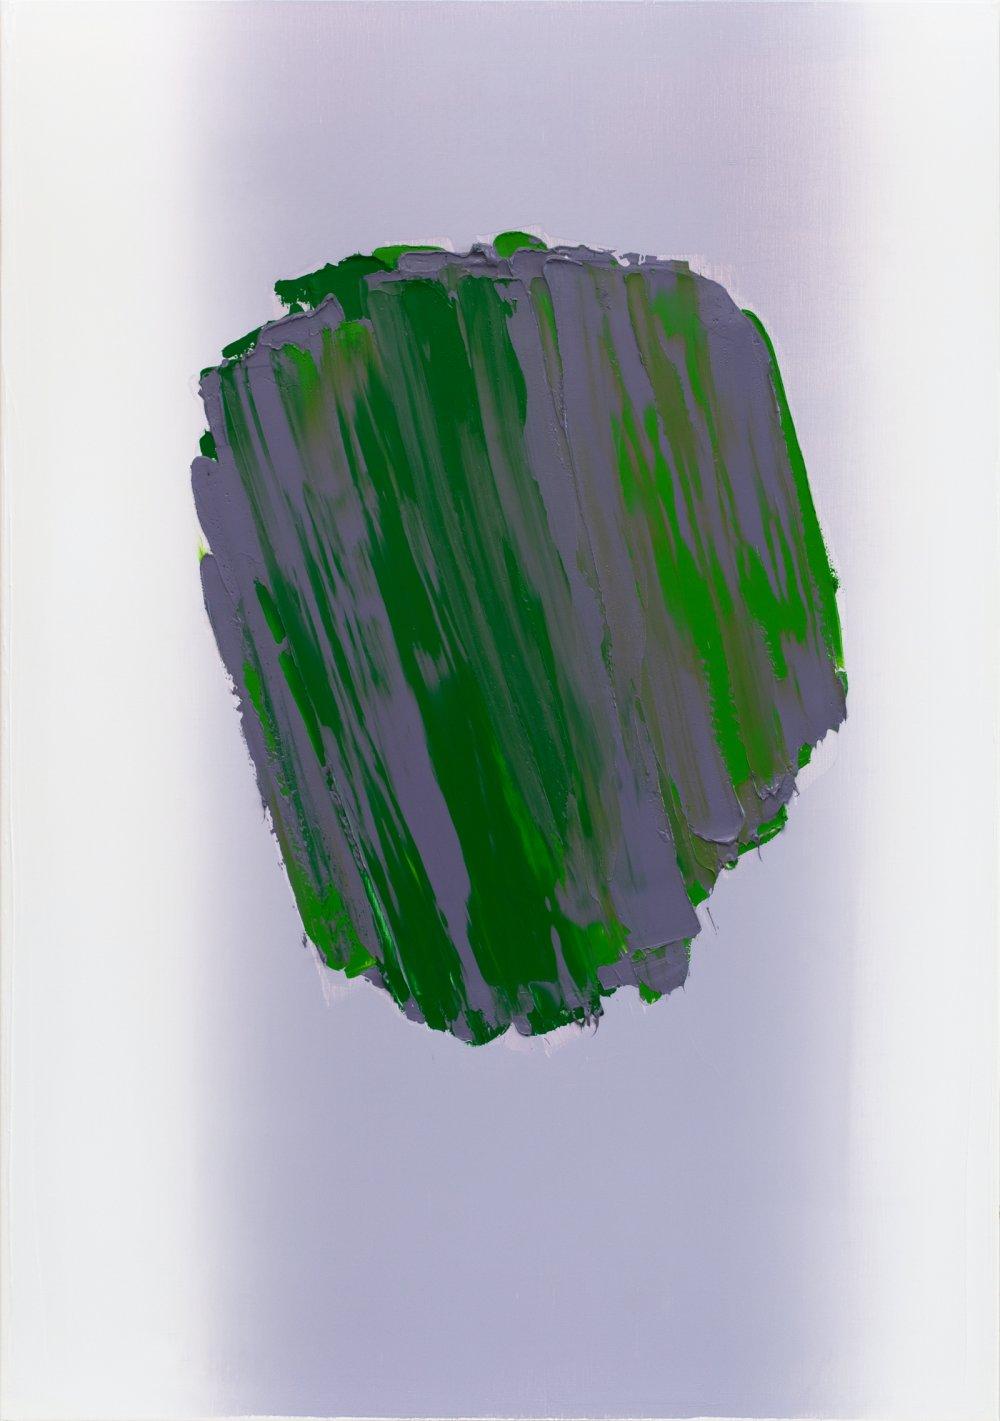 KEIN TITEL, PORTAITMOOD, B101020